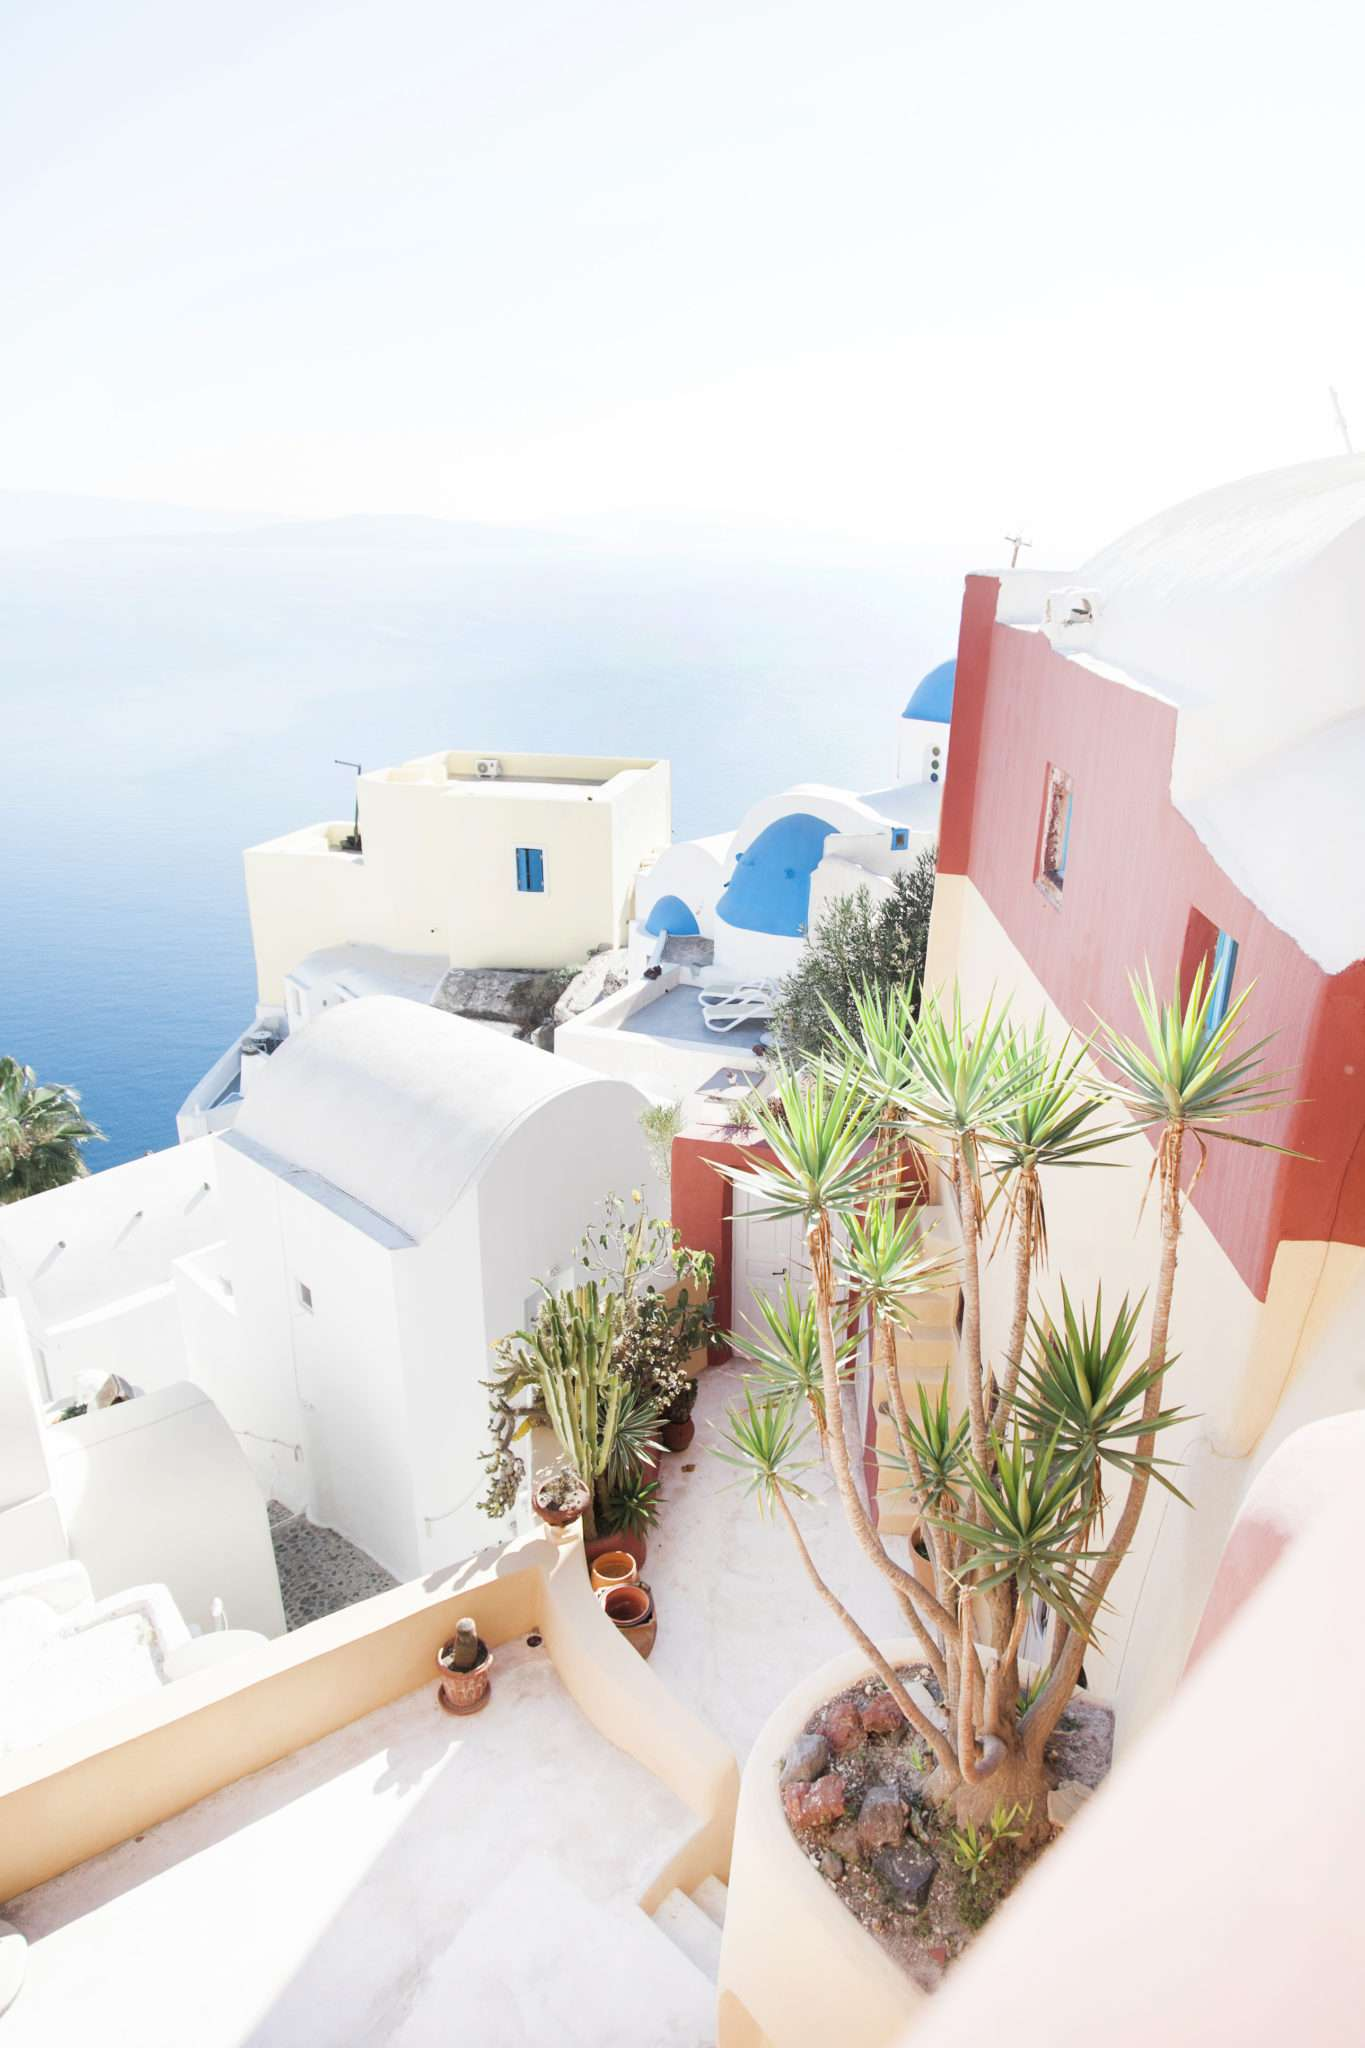 houses in santorini, greece destination wedding, greek wedding